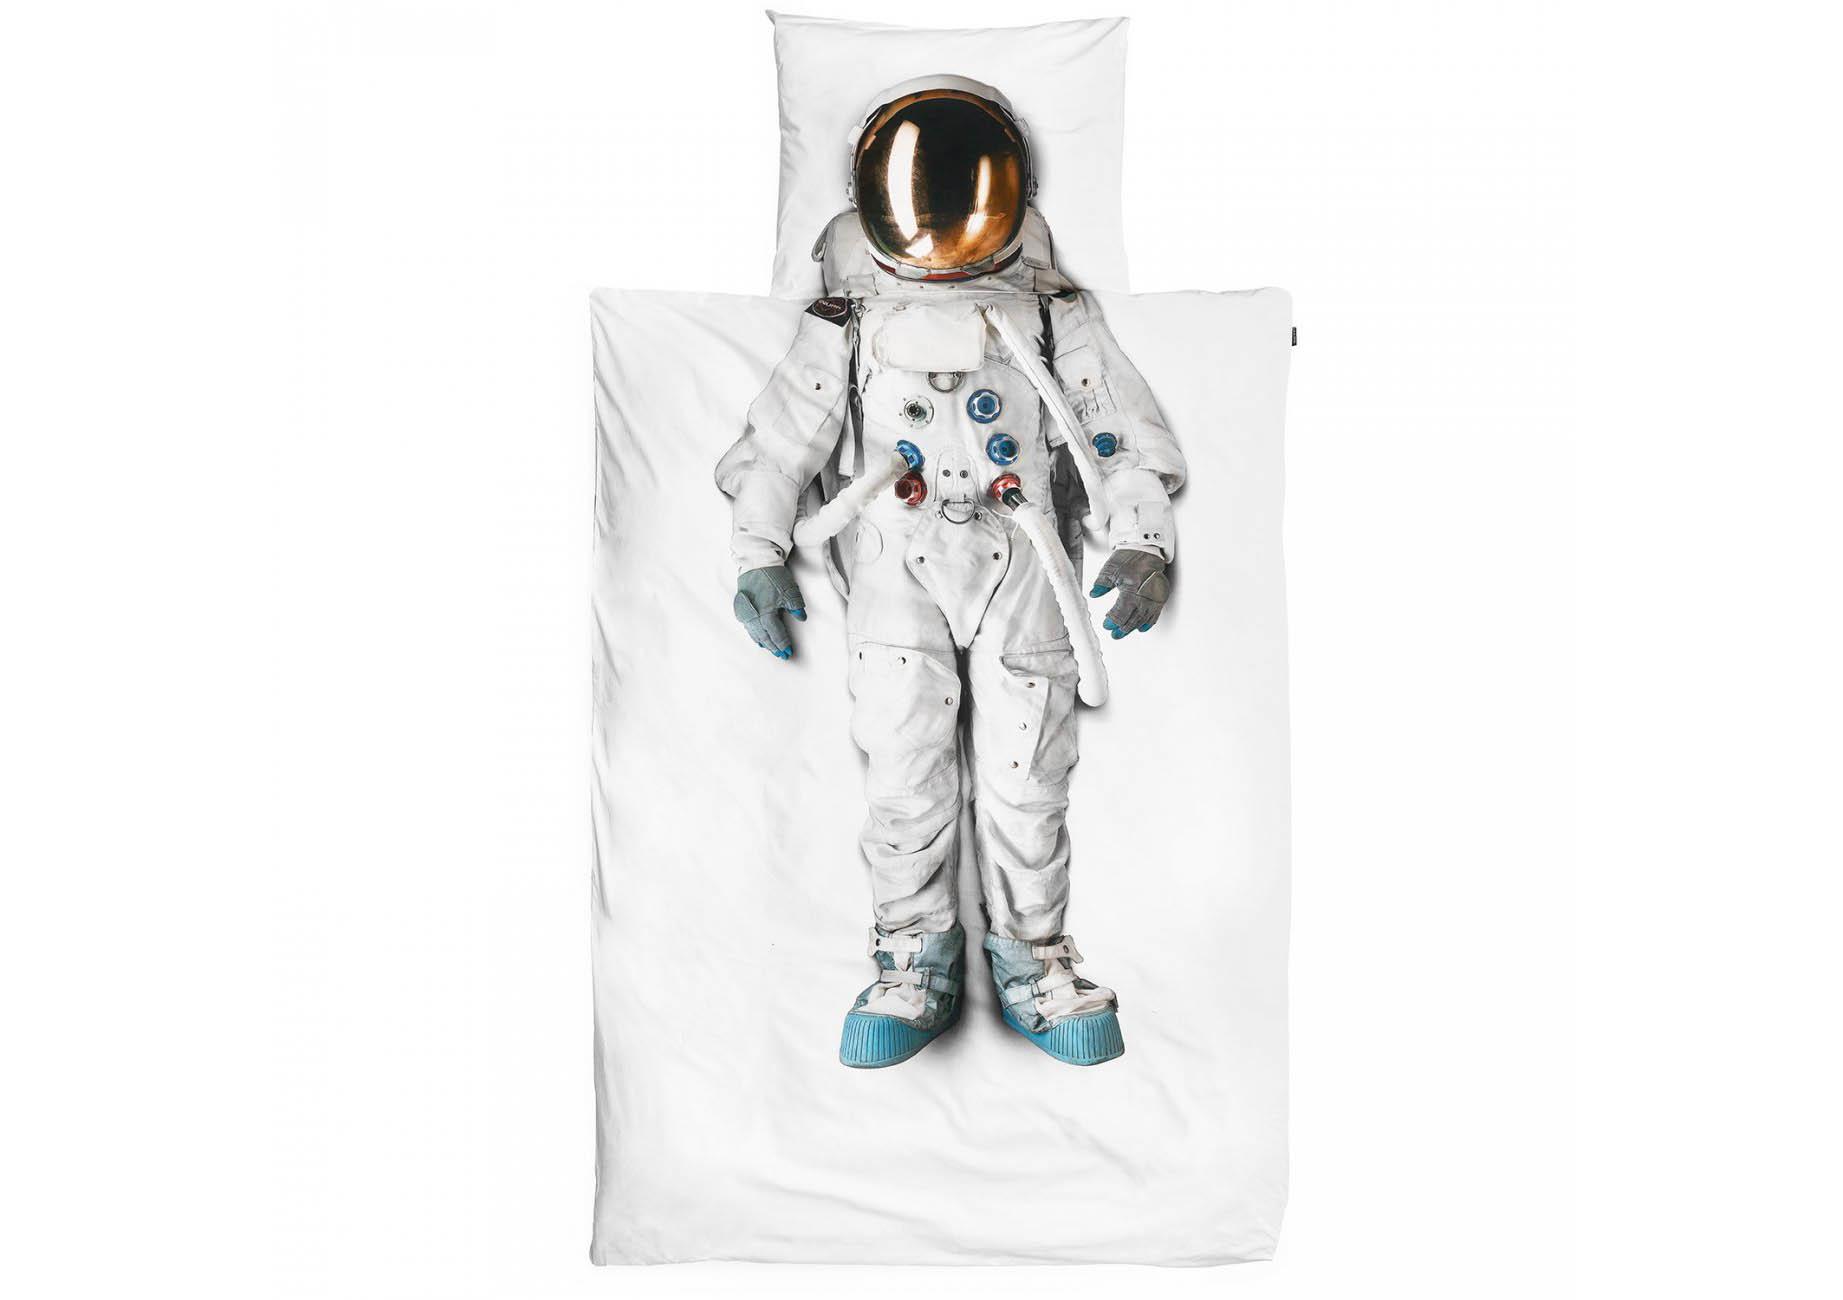 Edredon astronauta no disponible en - Portobellostreet es ...